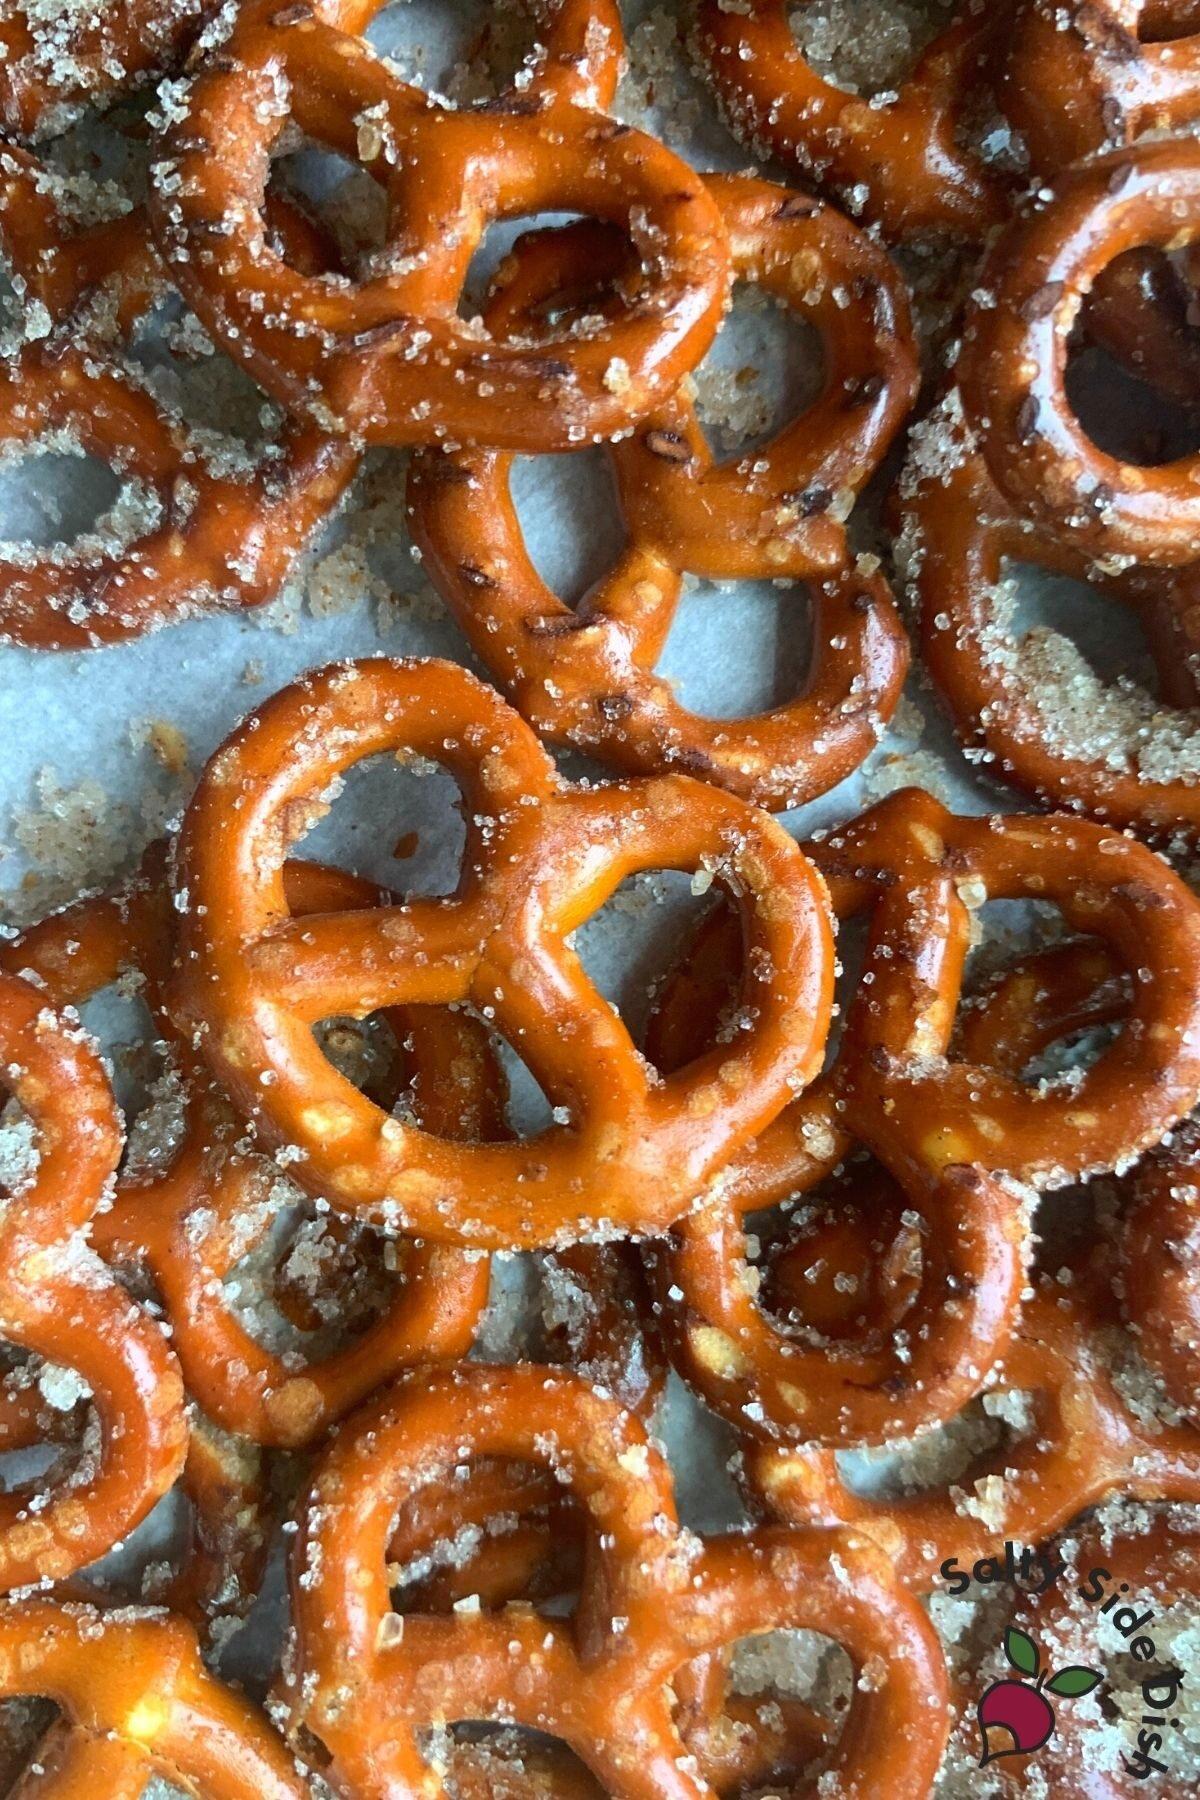 Cinnamon Sugar Pretzels recipe.